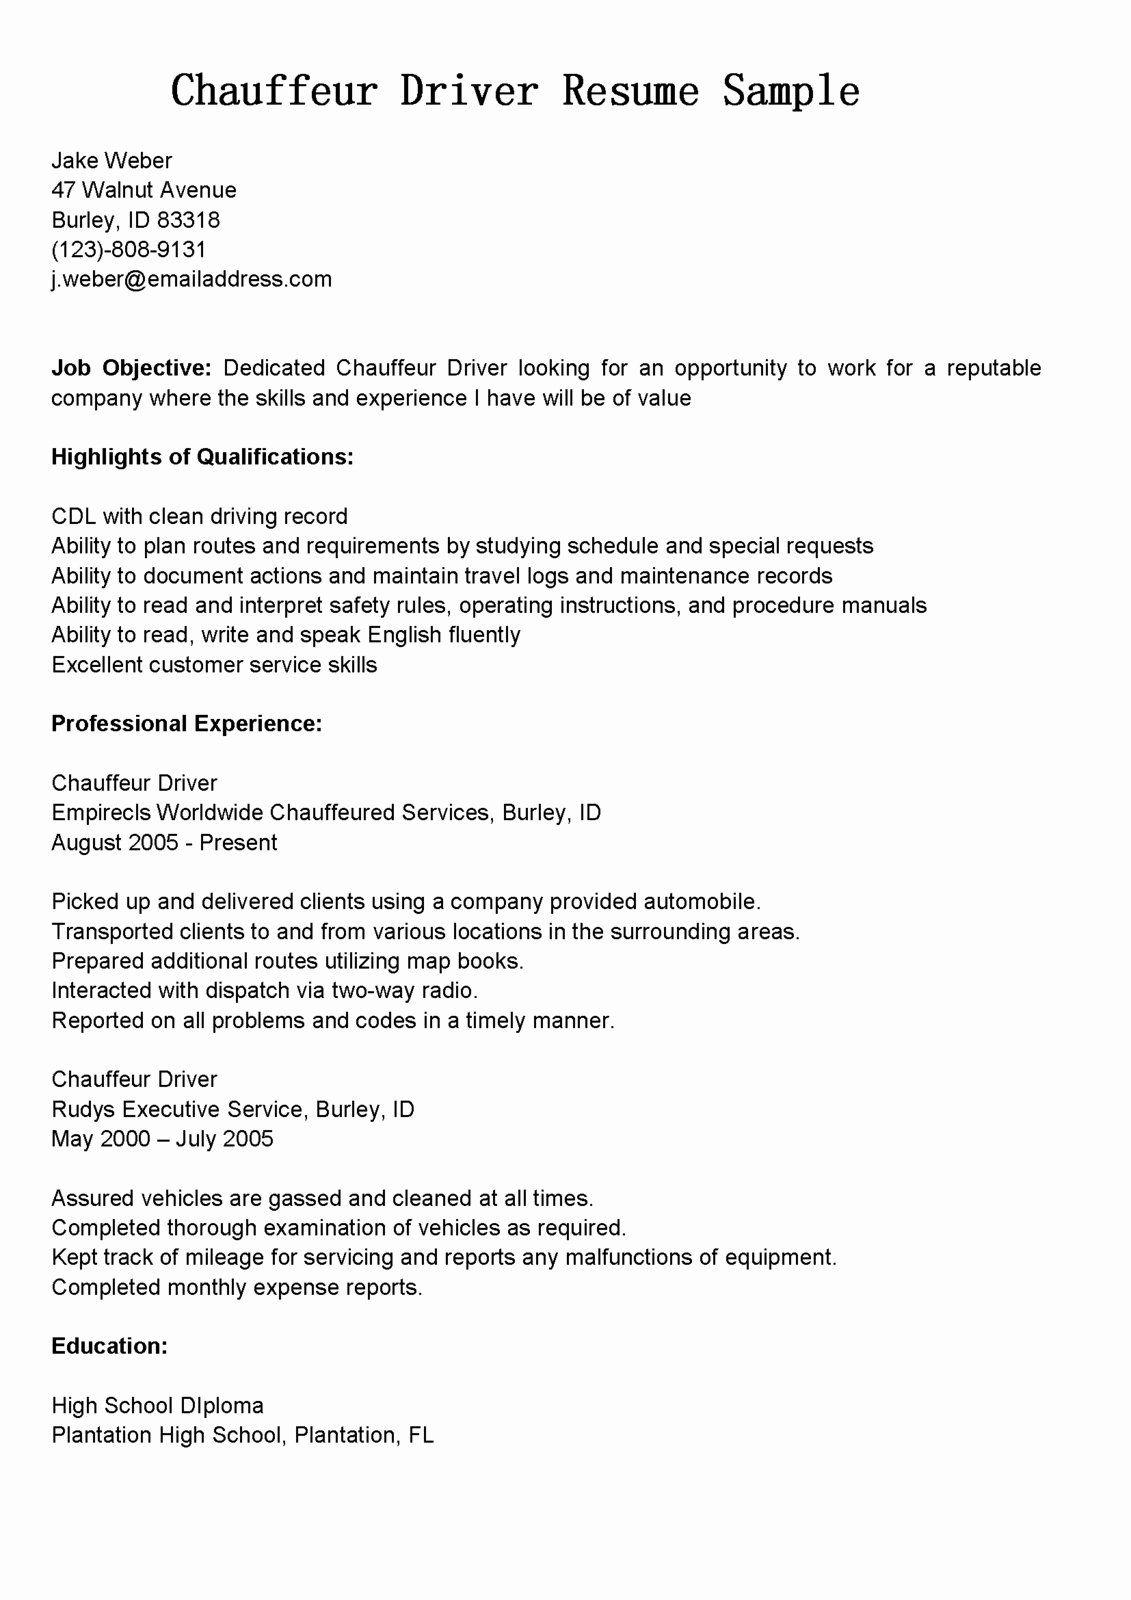 23 Uber Driver Job Description Resume In 2020 Driver Job